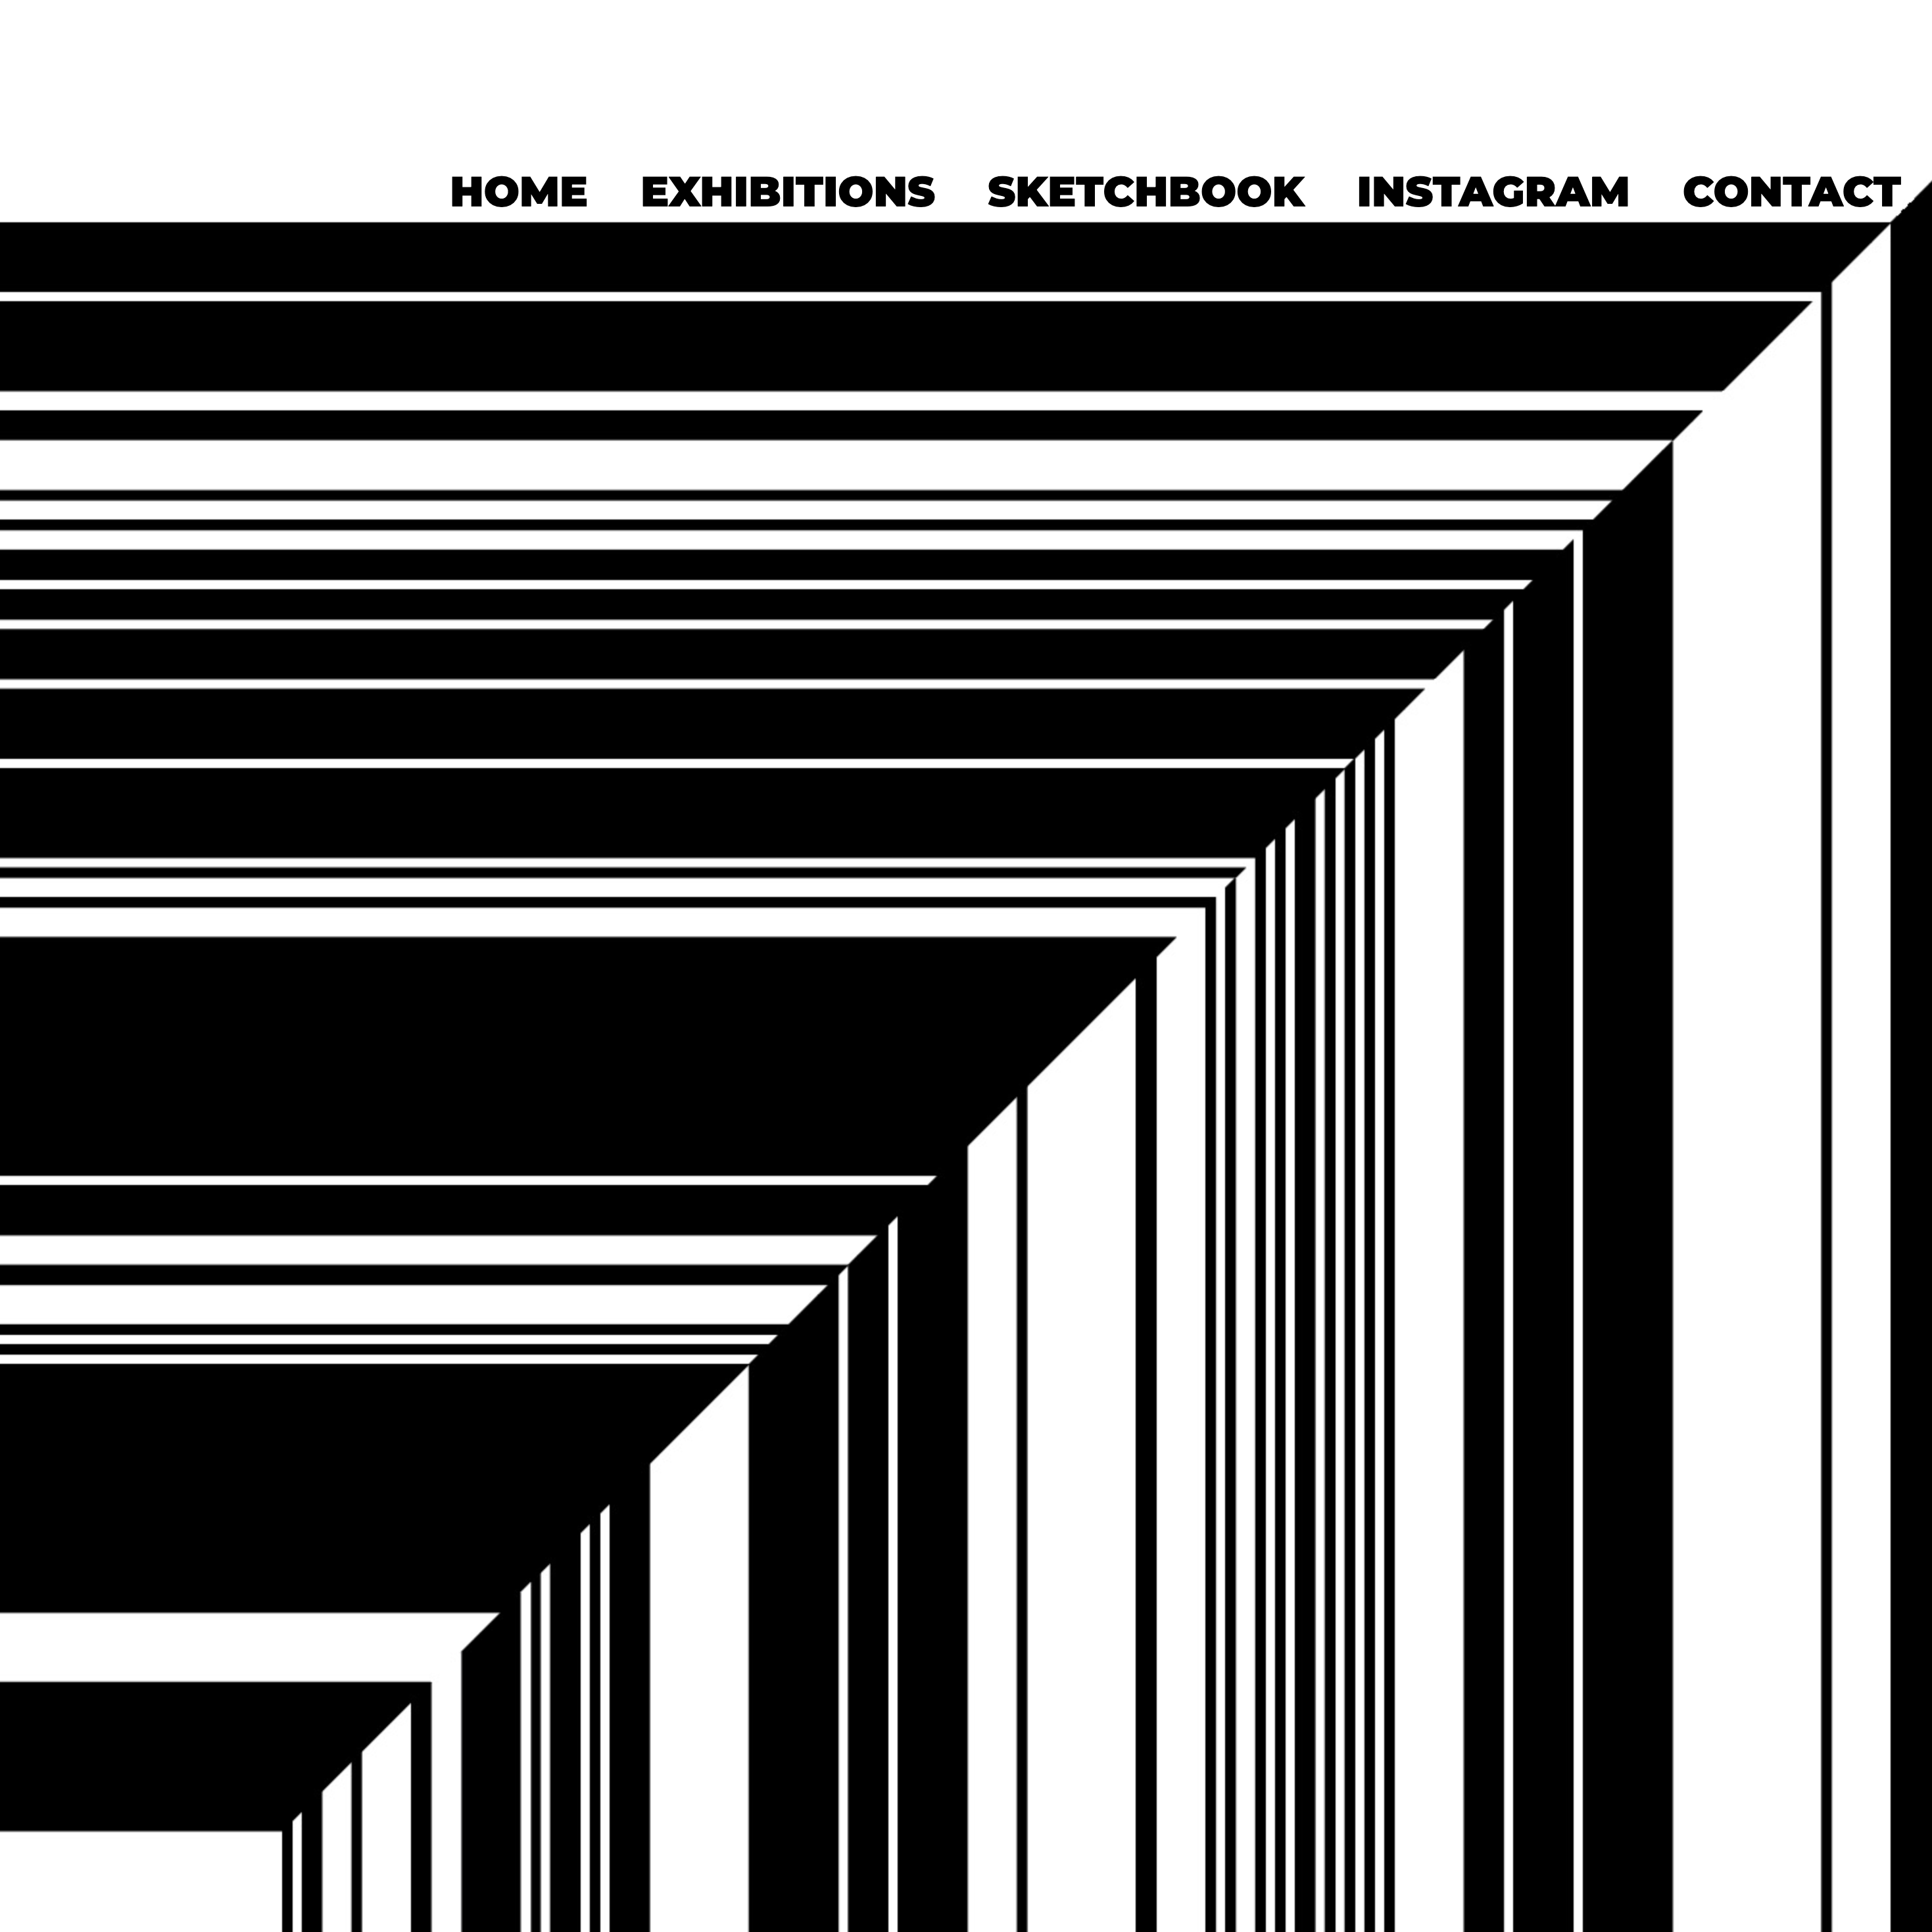 screencapture-lisamarietheartist-menu-2020-12-22-19_25_22